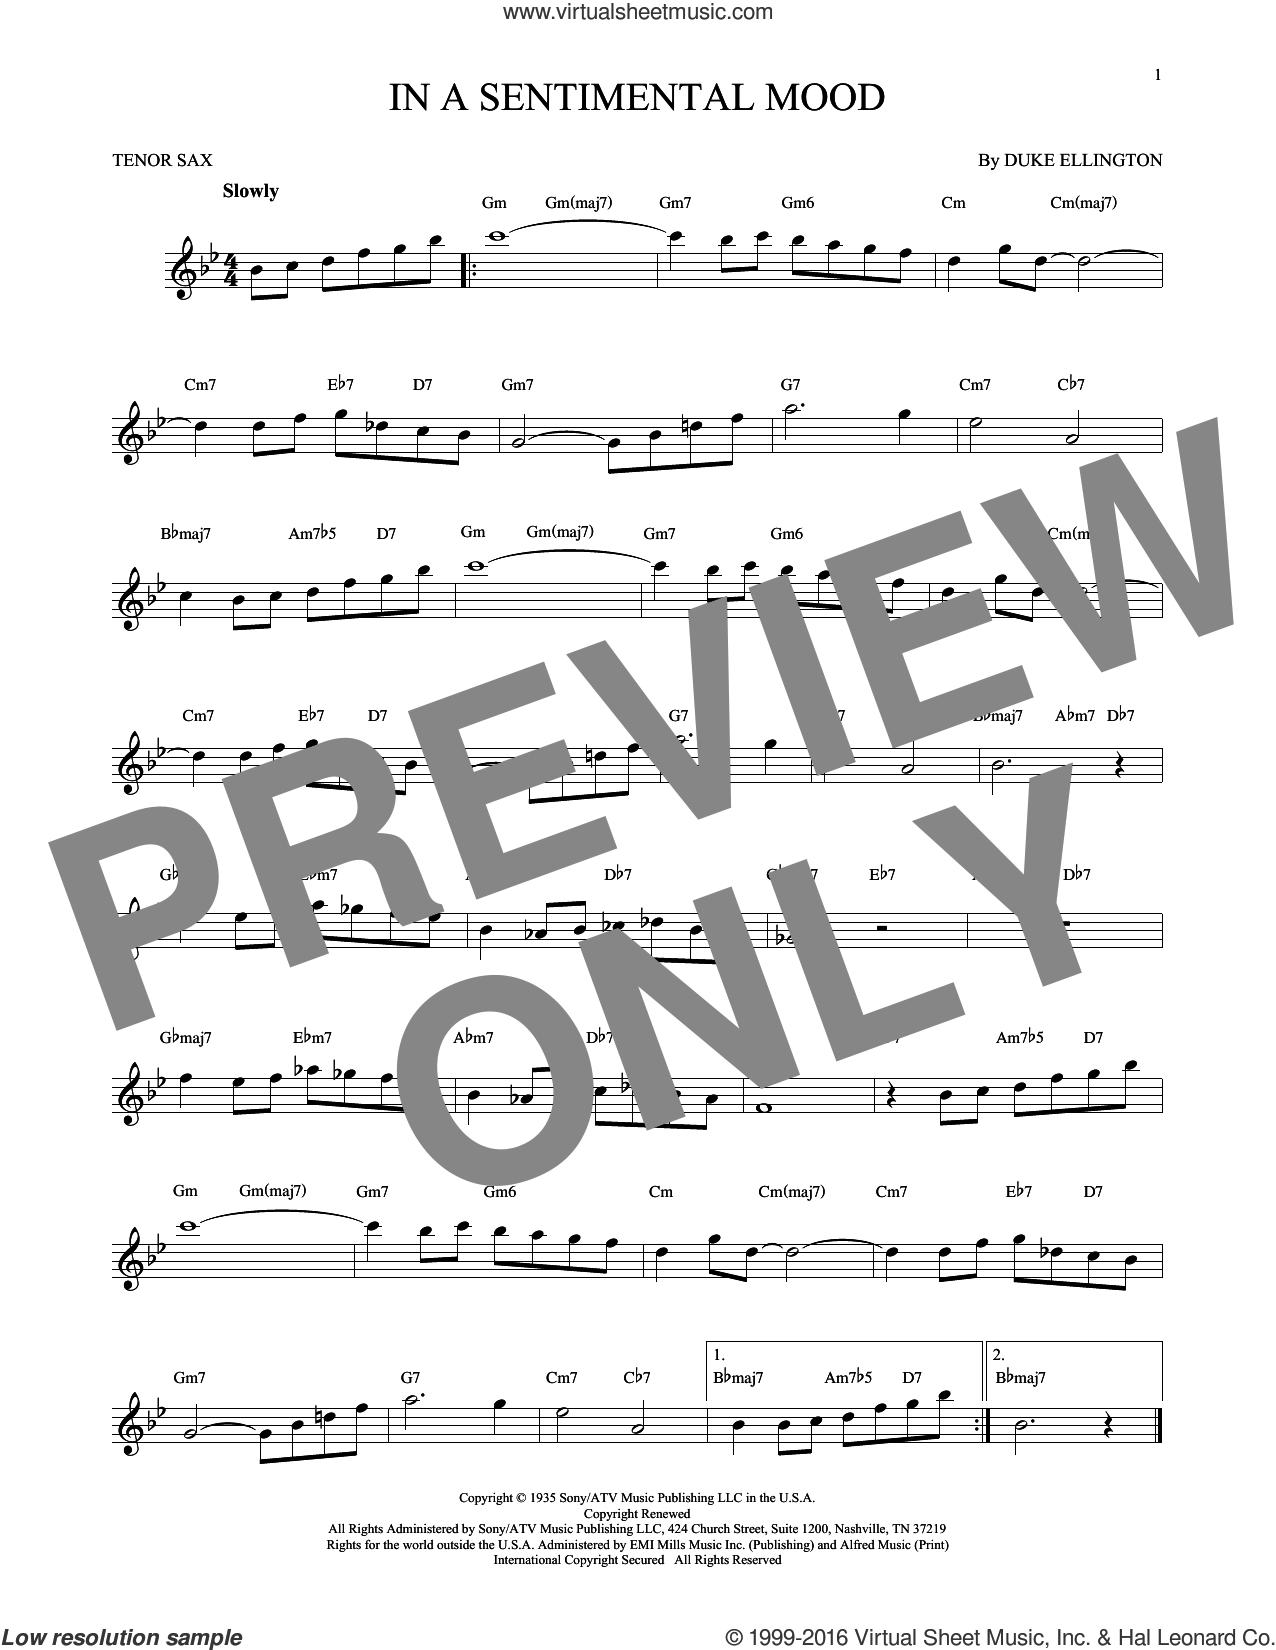 In A Sentimental Mood sheet music for tenor saxophone solo by Duke Ellington, Irving Mills and Manny Kurtz, intermediate skill level